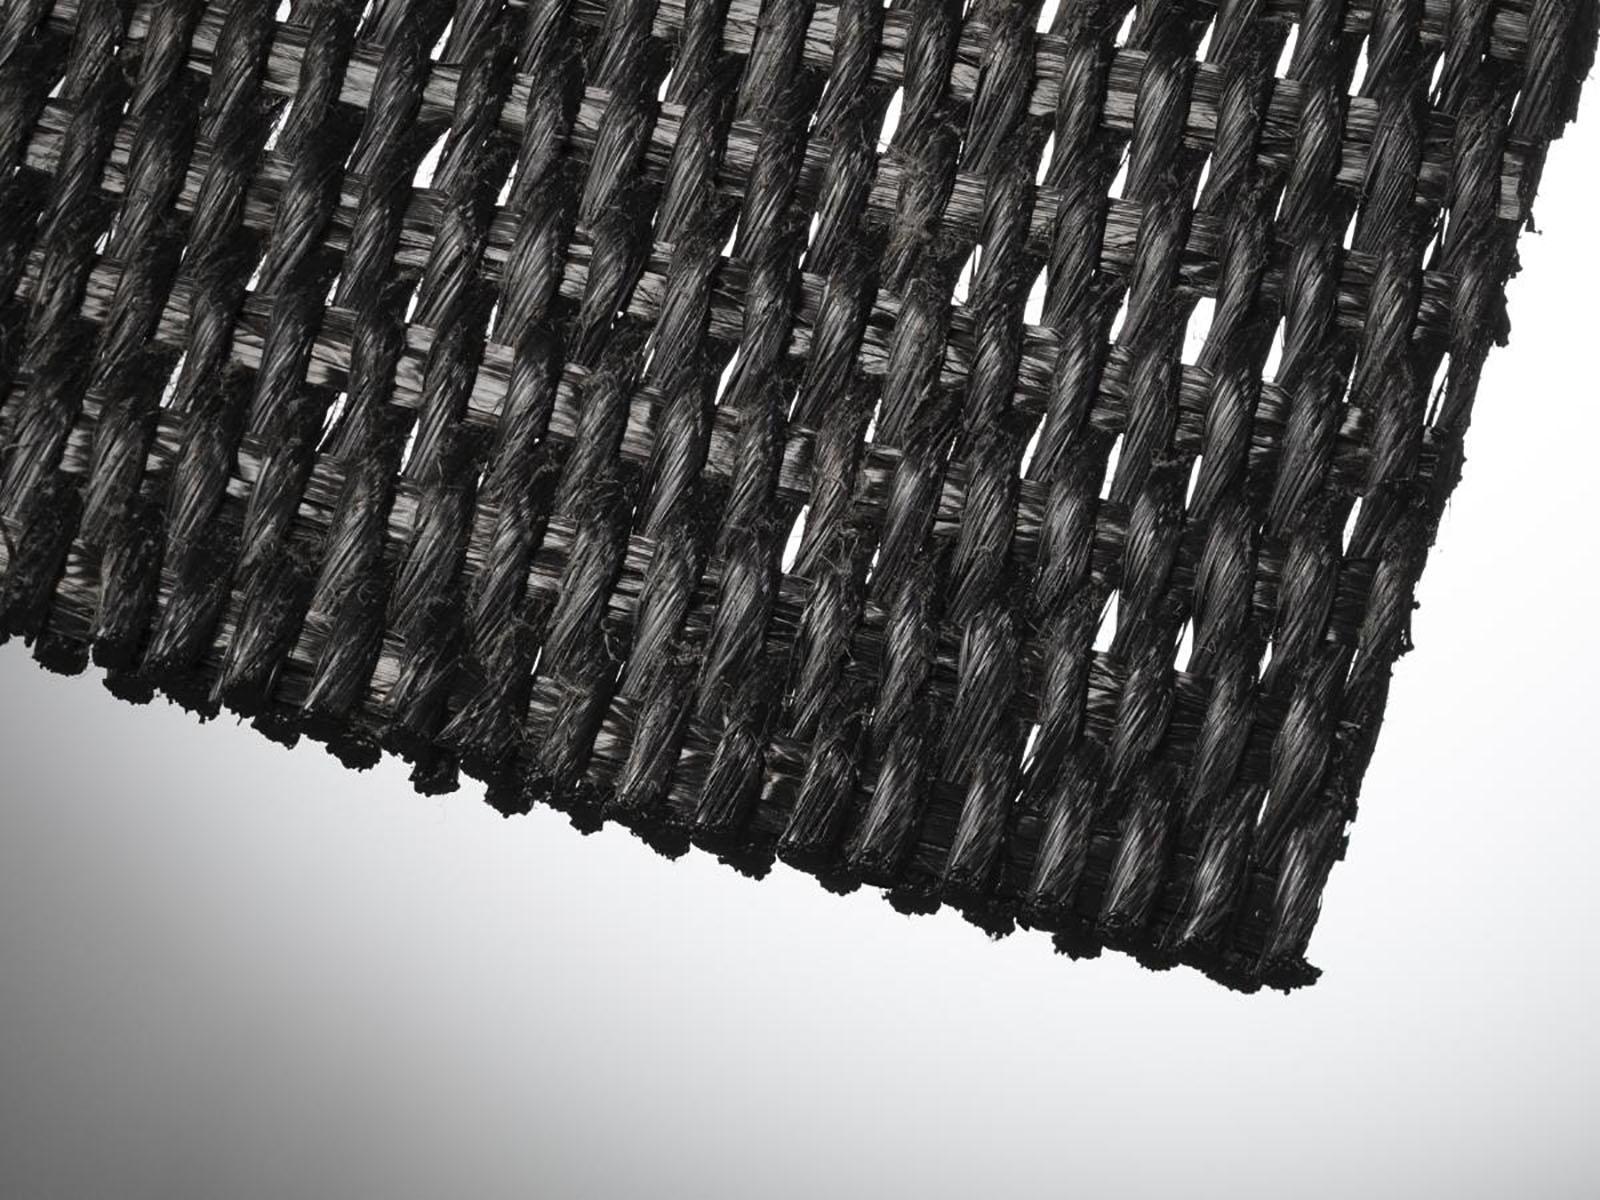 Tape fabric